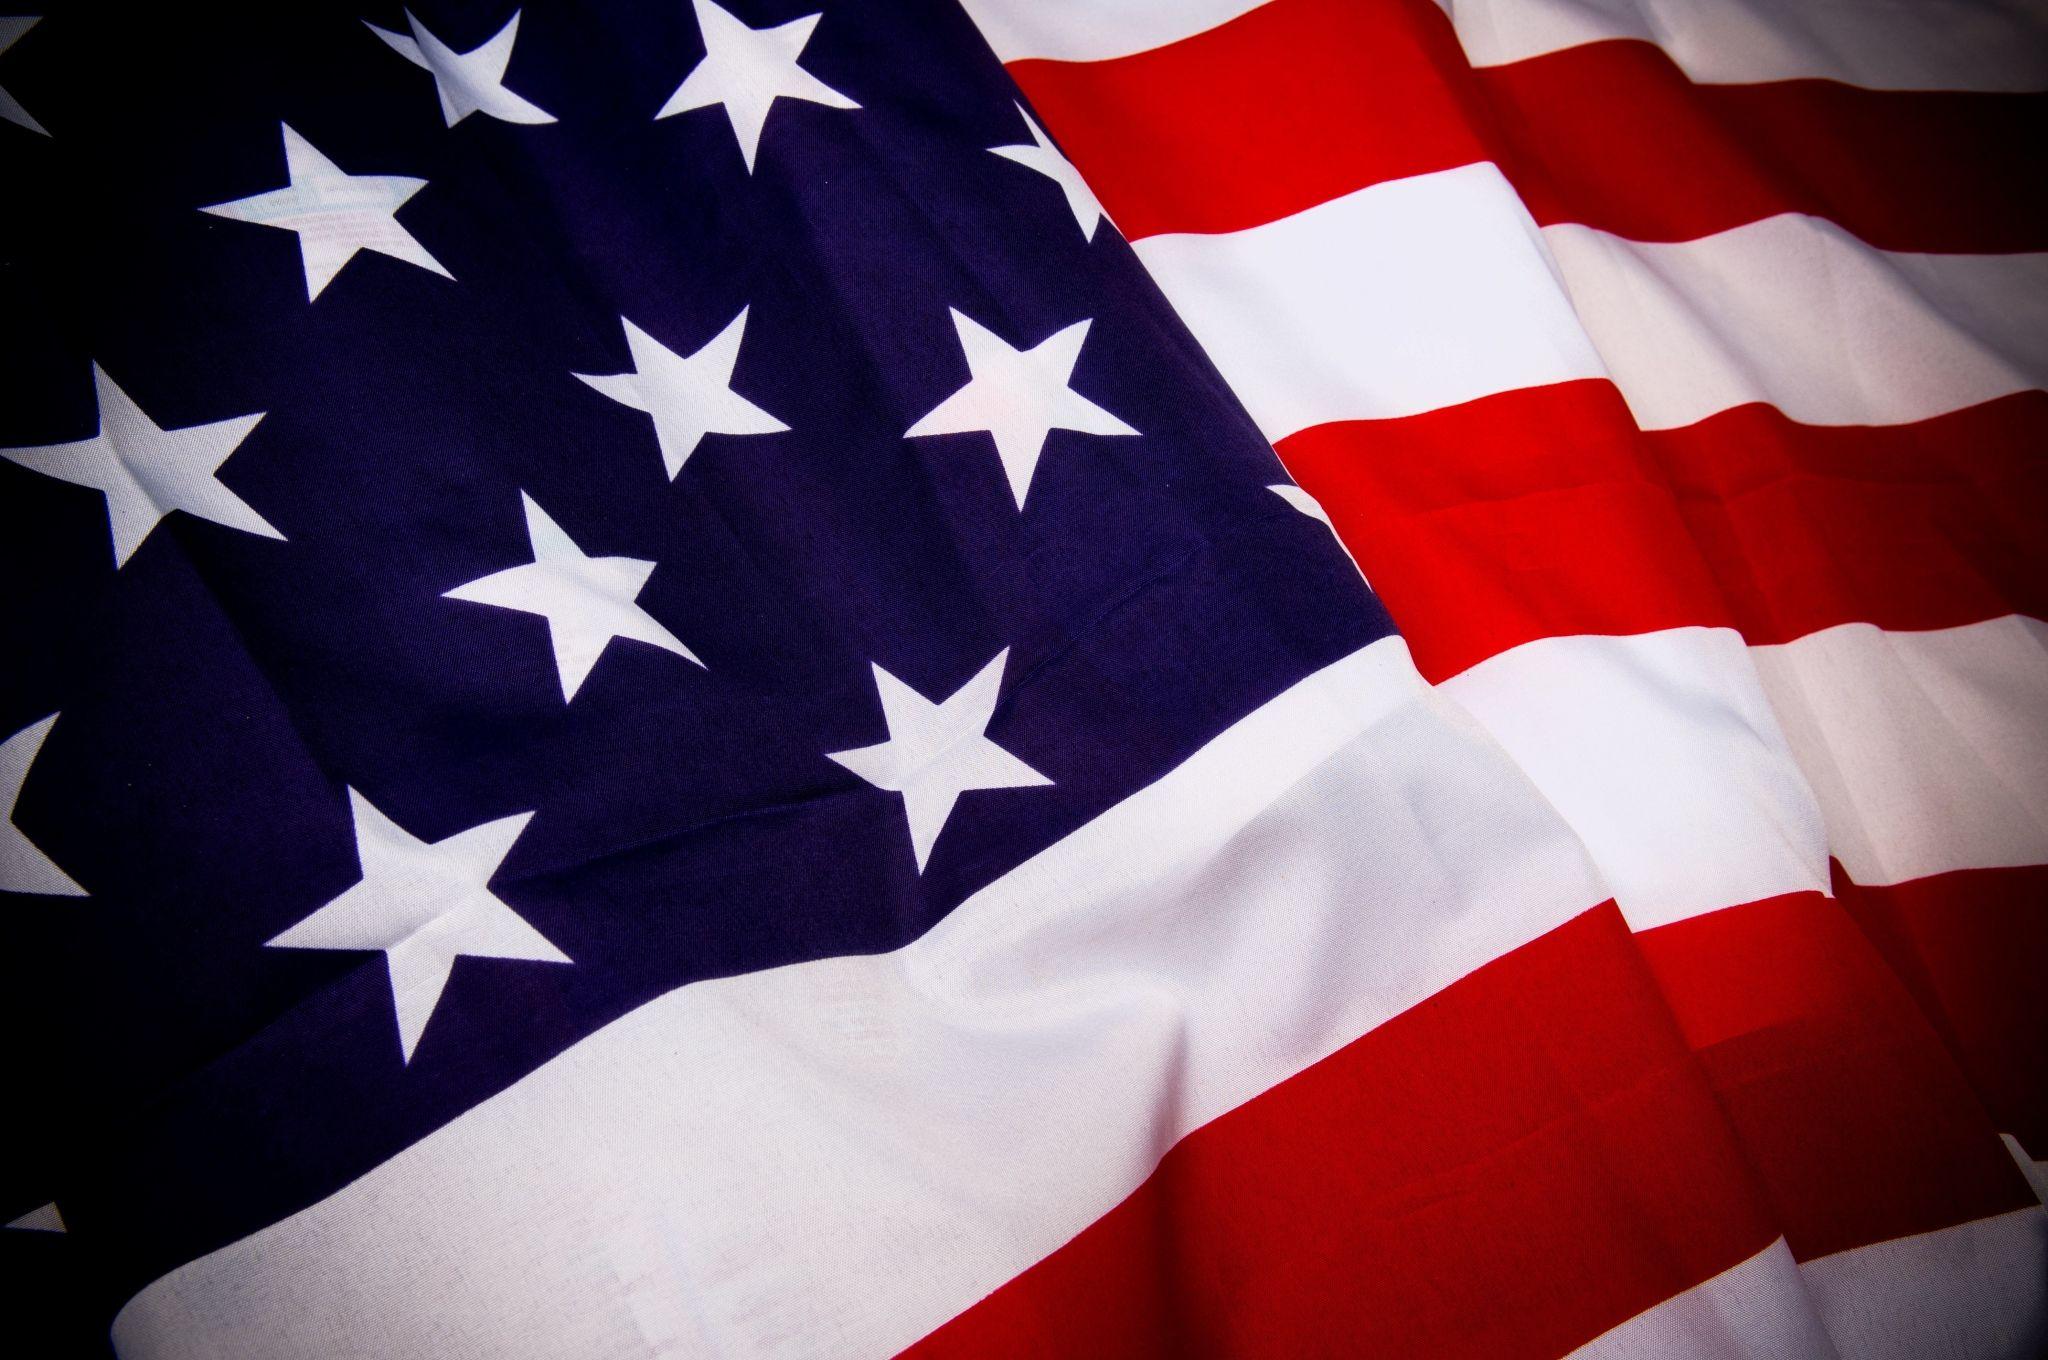 Hd wallpaper usa flag - American Flag Wallpaper